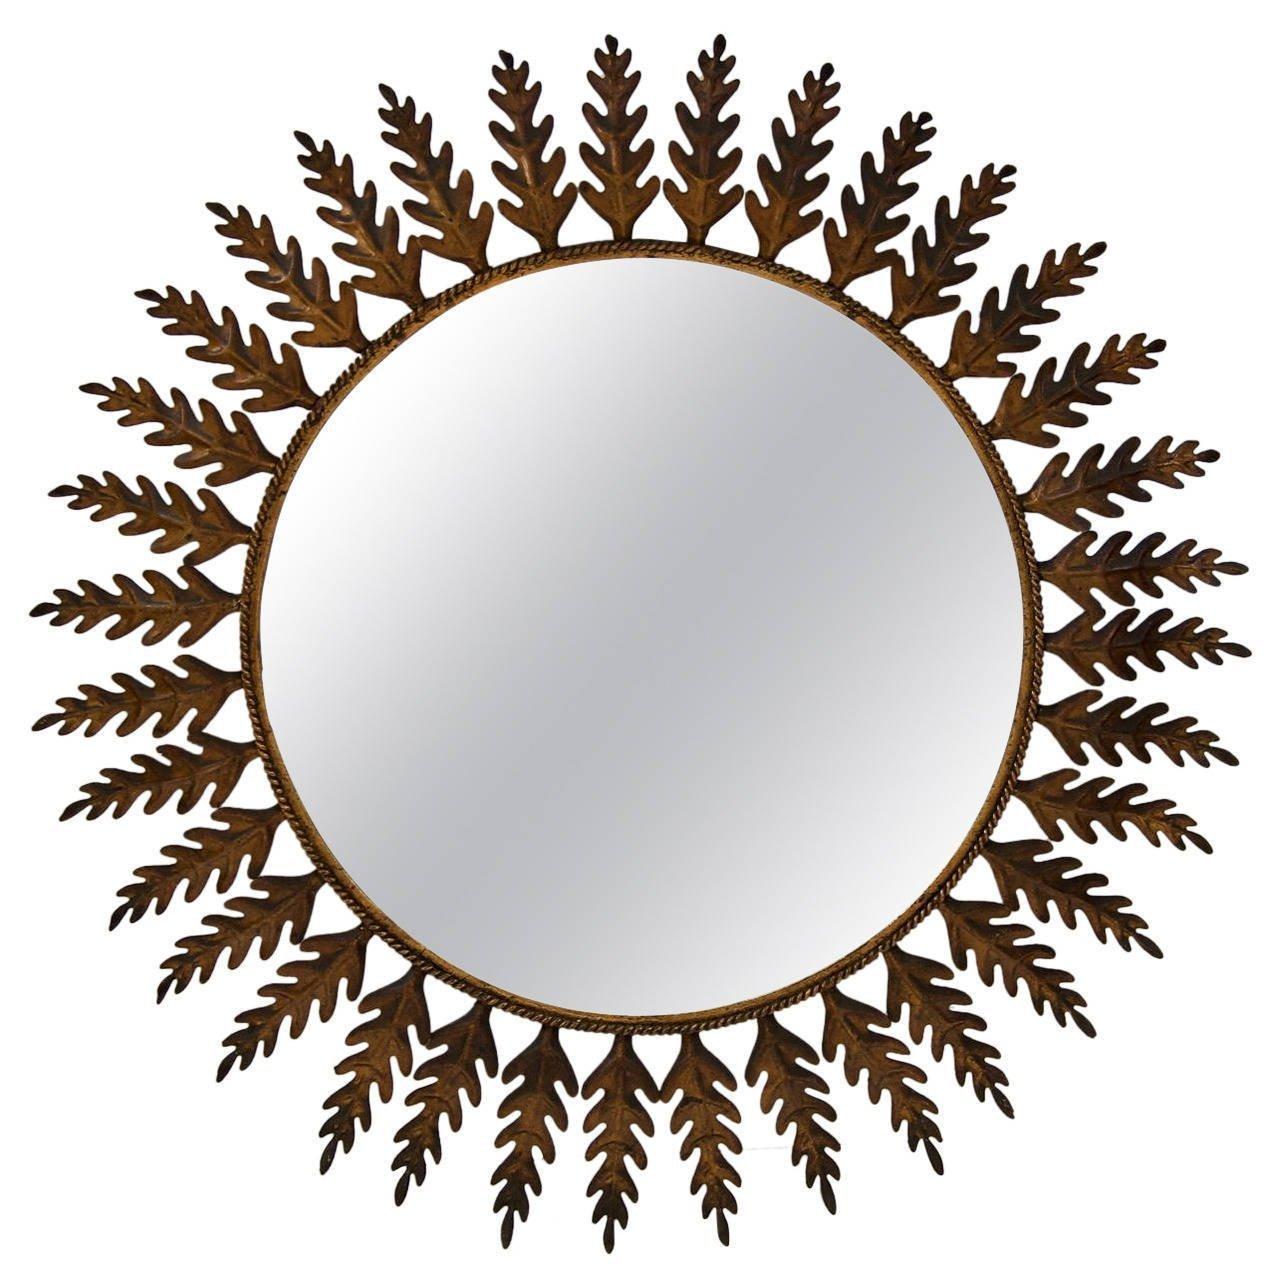 Posh Spanish Netflix Spanish Black Mirror Flessas Design Huge Metal Round Leafed Spanish Mirror Flessas Design Broken Mirror houzz-02 Mirror In Spanish